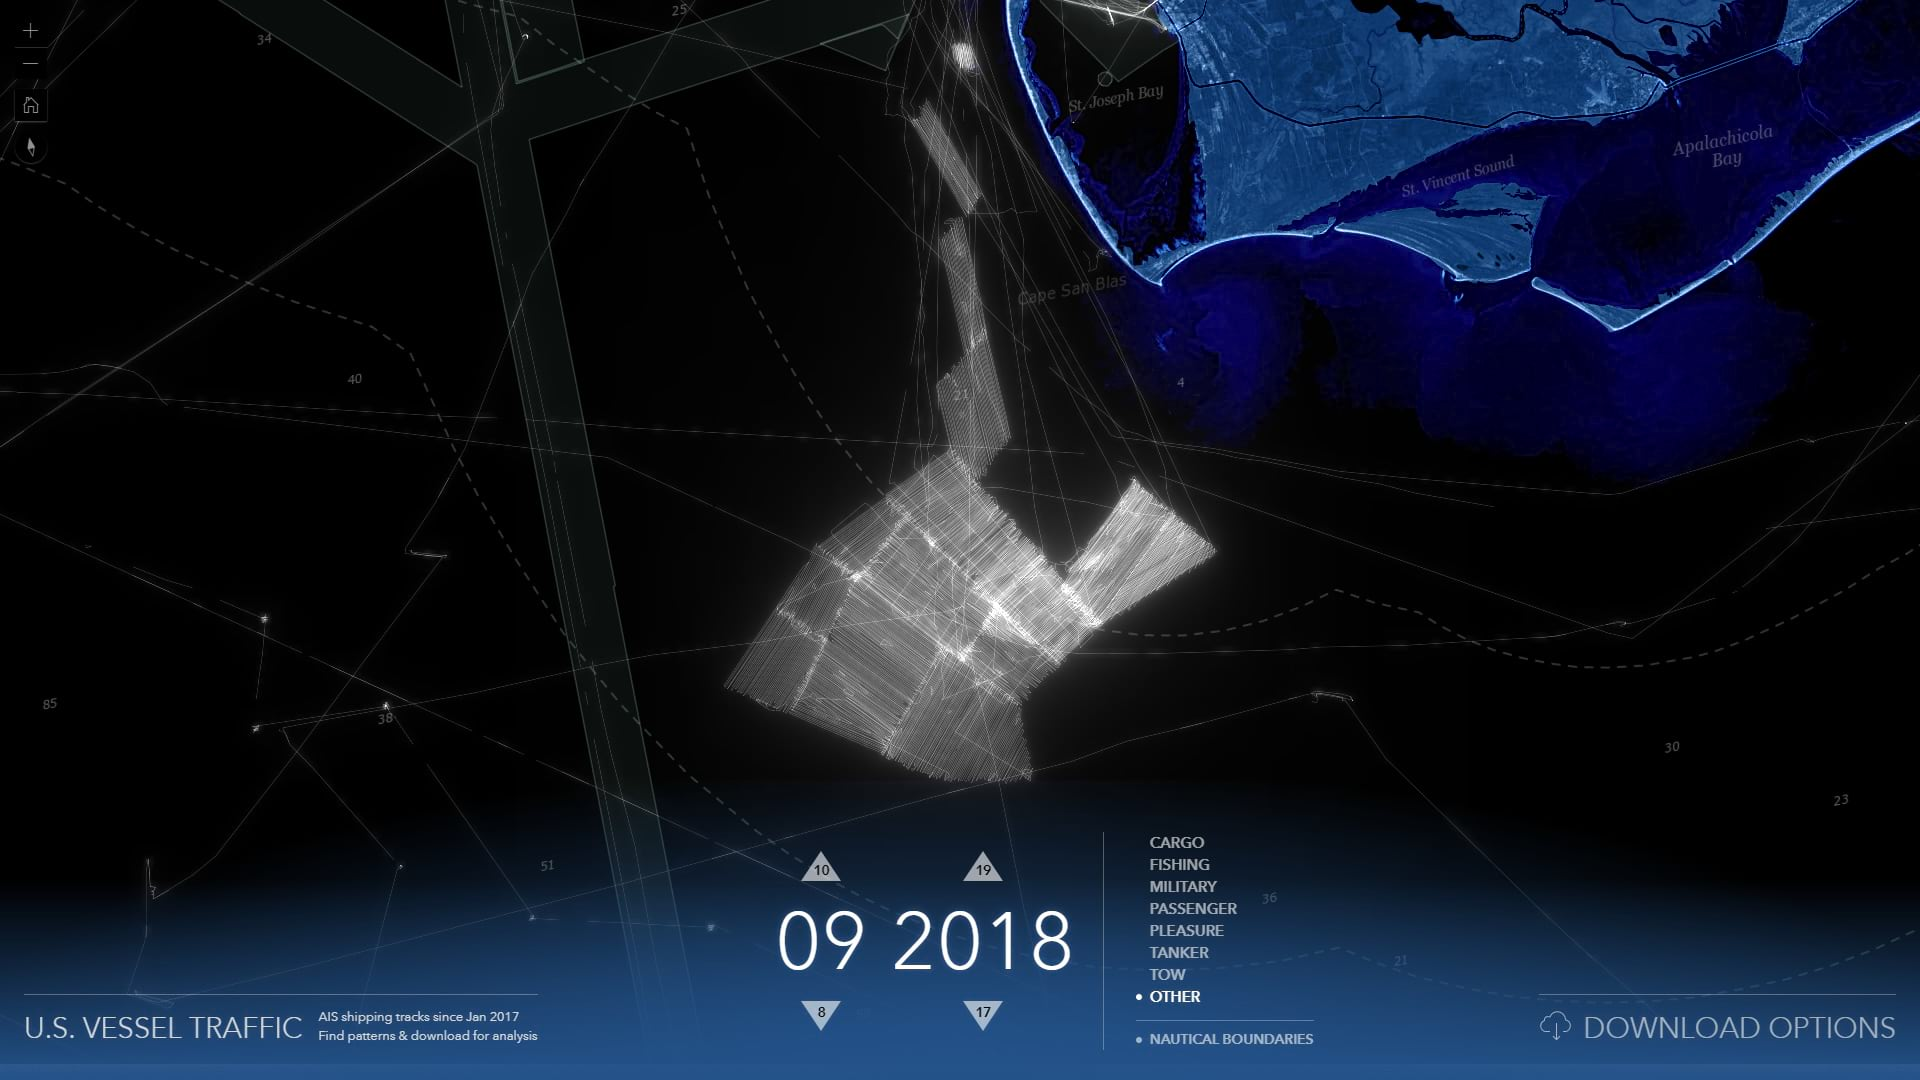 Vessel traffic in a strong grid pattern.